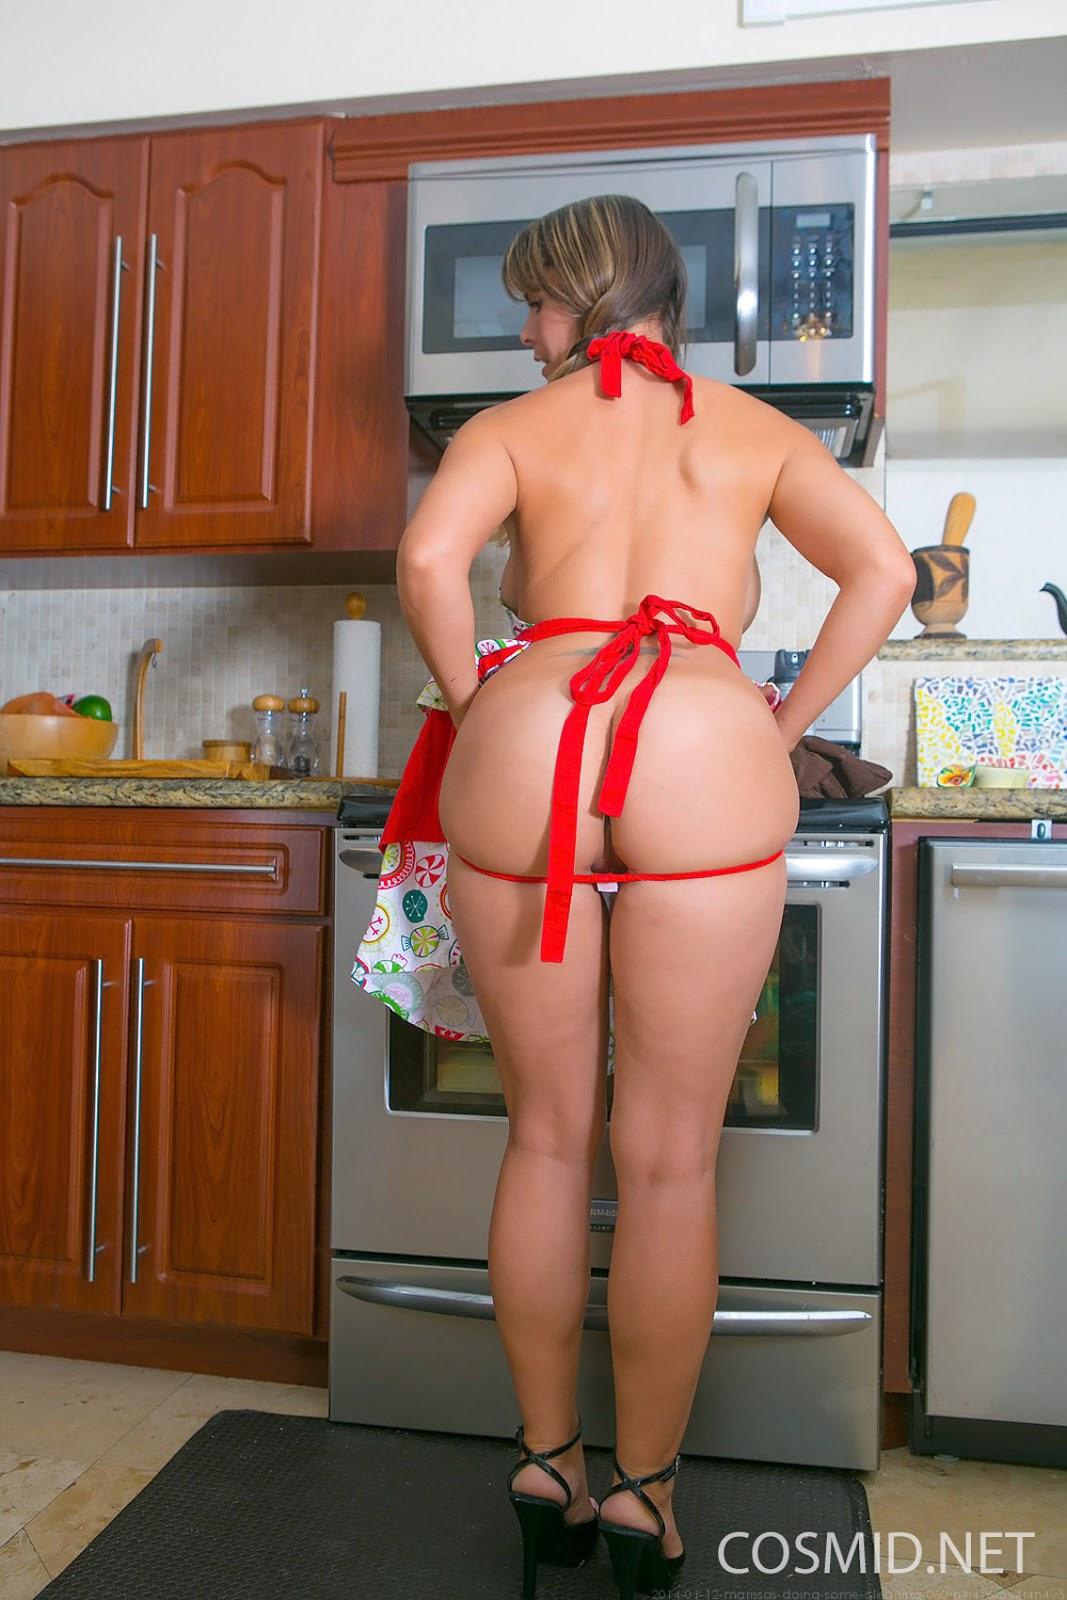 Simone the kitchen maid @ filf24 trailer